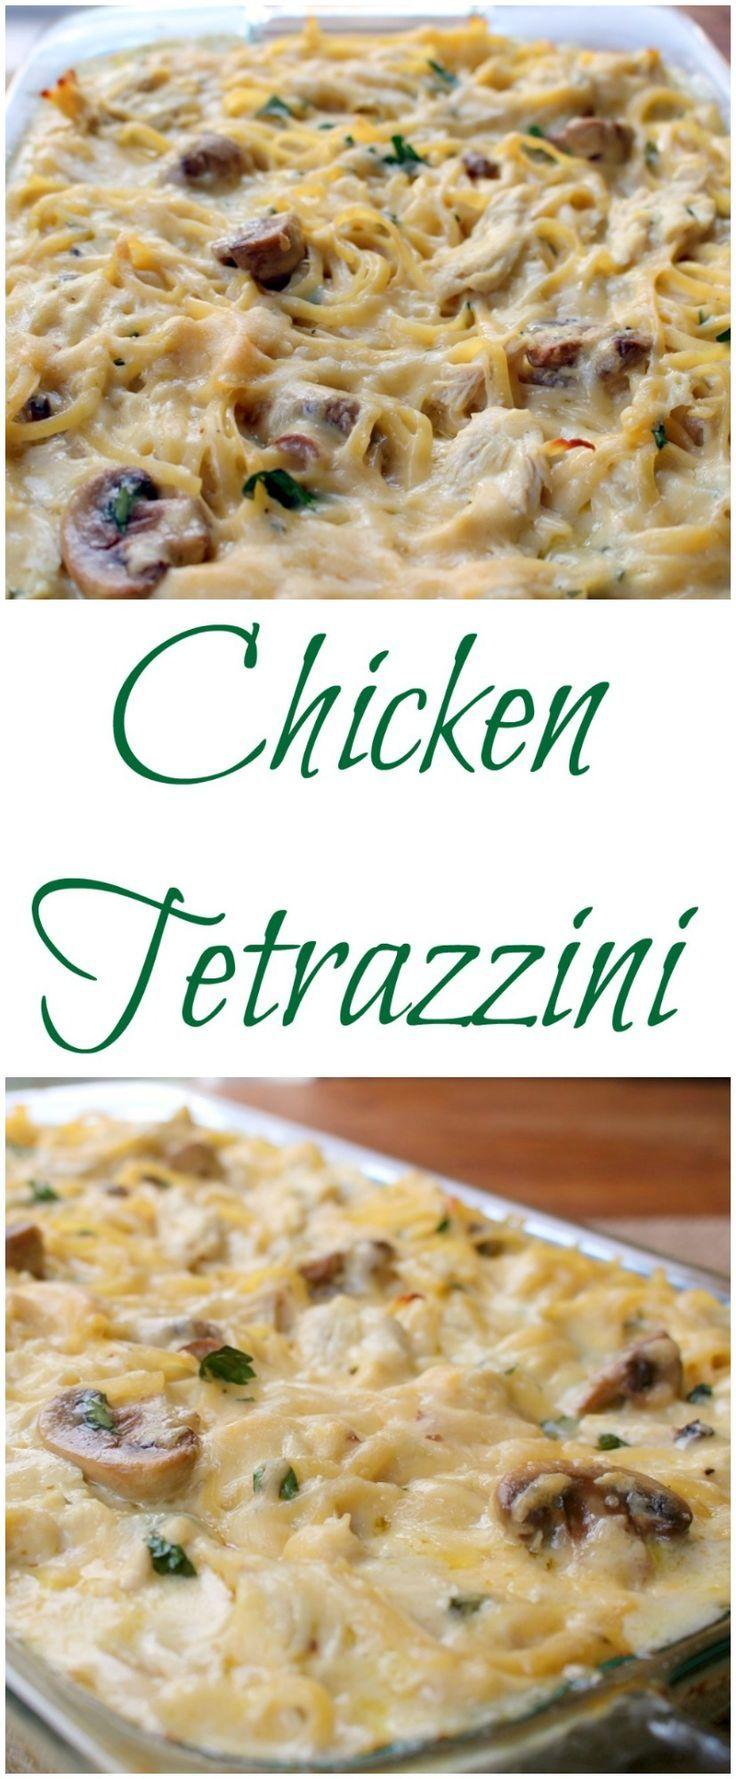 Chicken Tetrazzini - The Ramblings of an Aspiring Small Town Girl